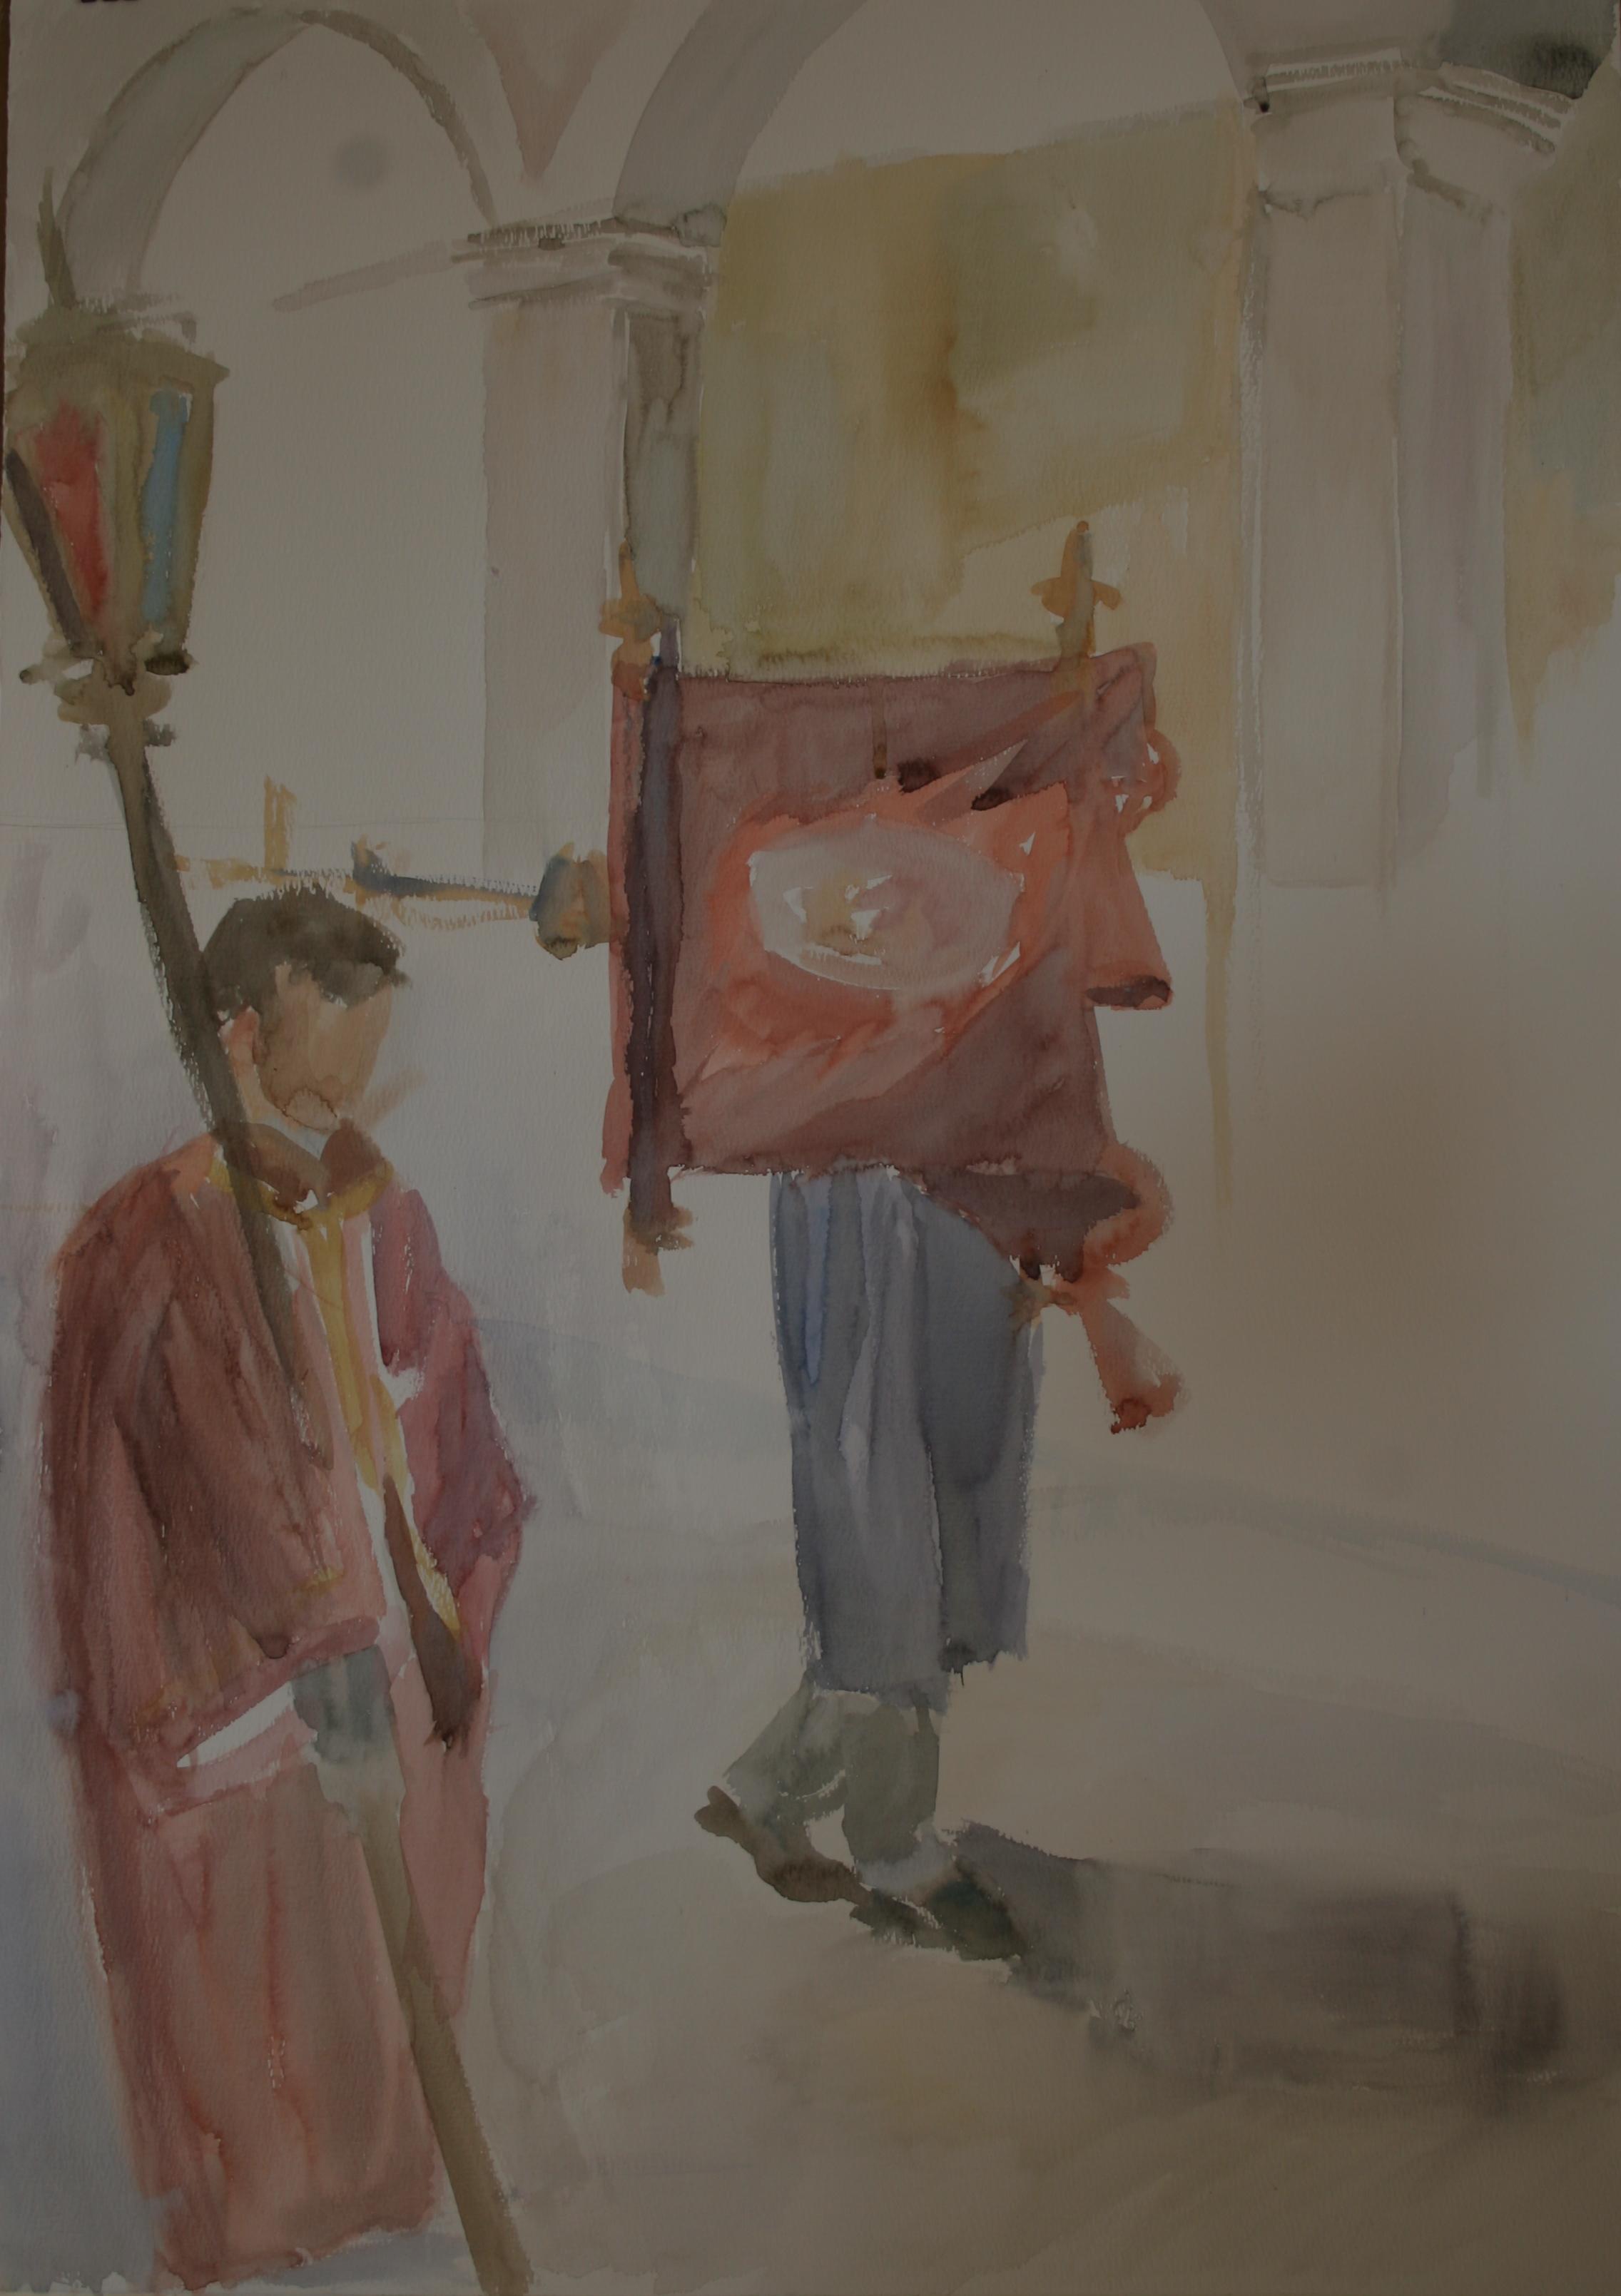 Kolyvas_2013_watercolor_70cm x 100cm_litany.JPG